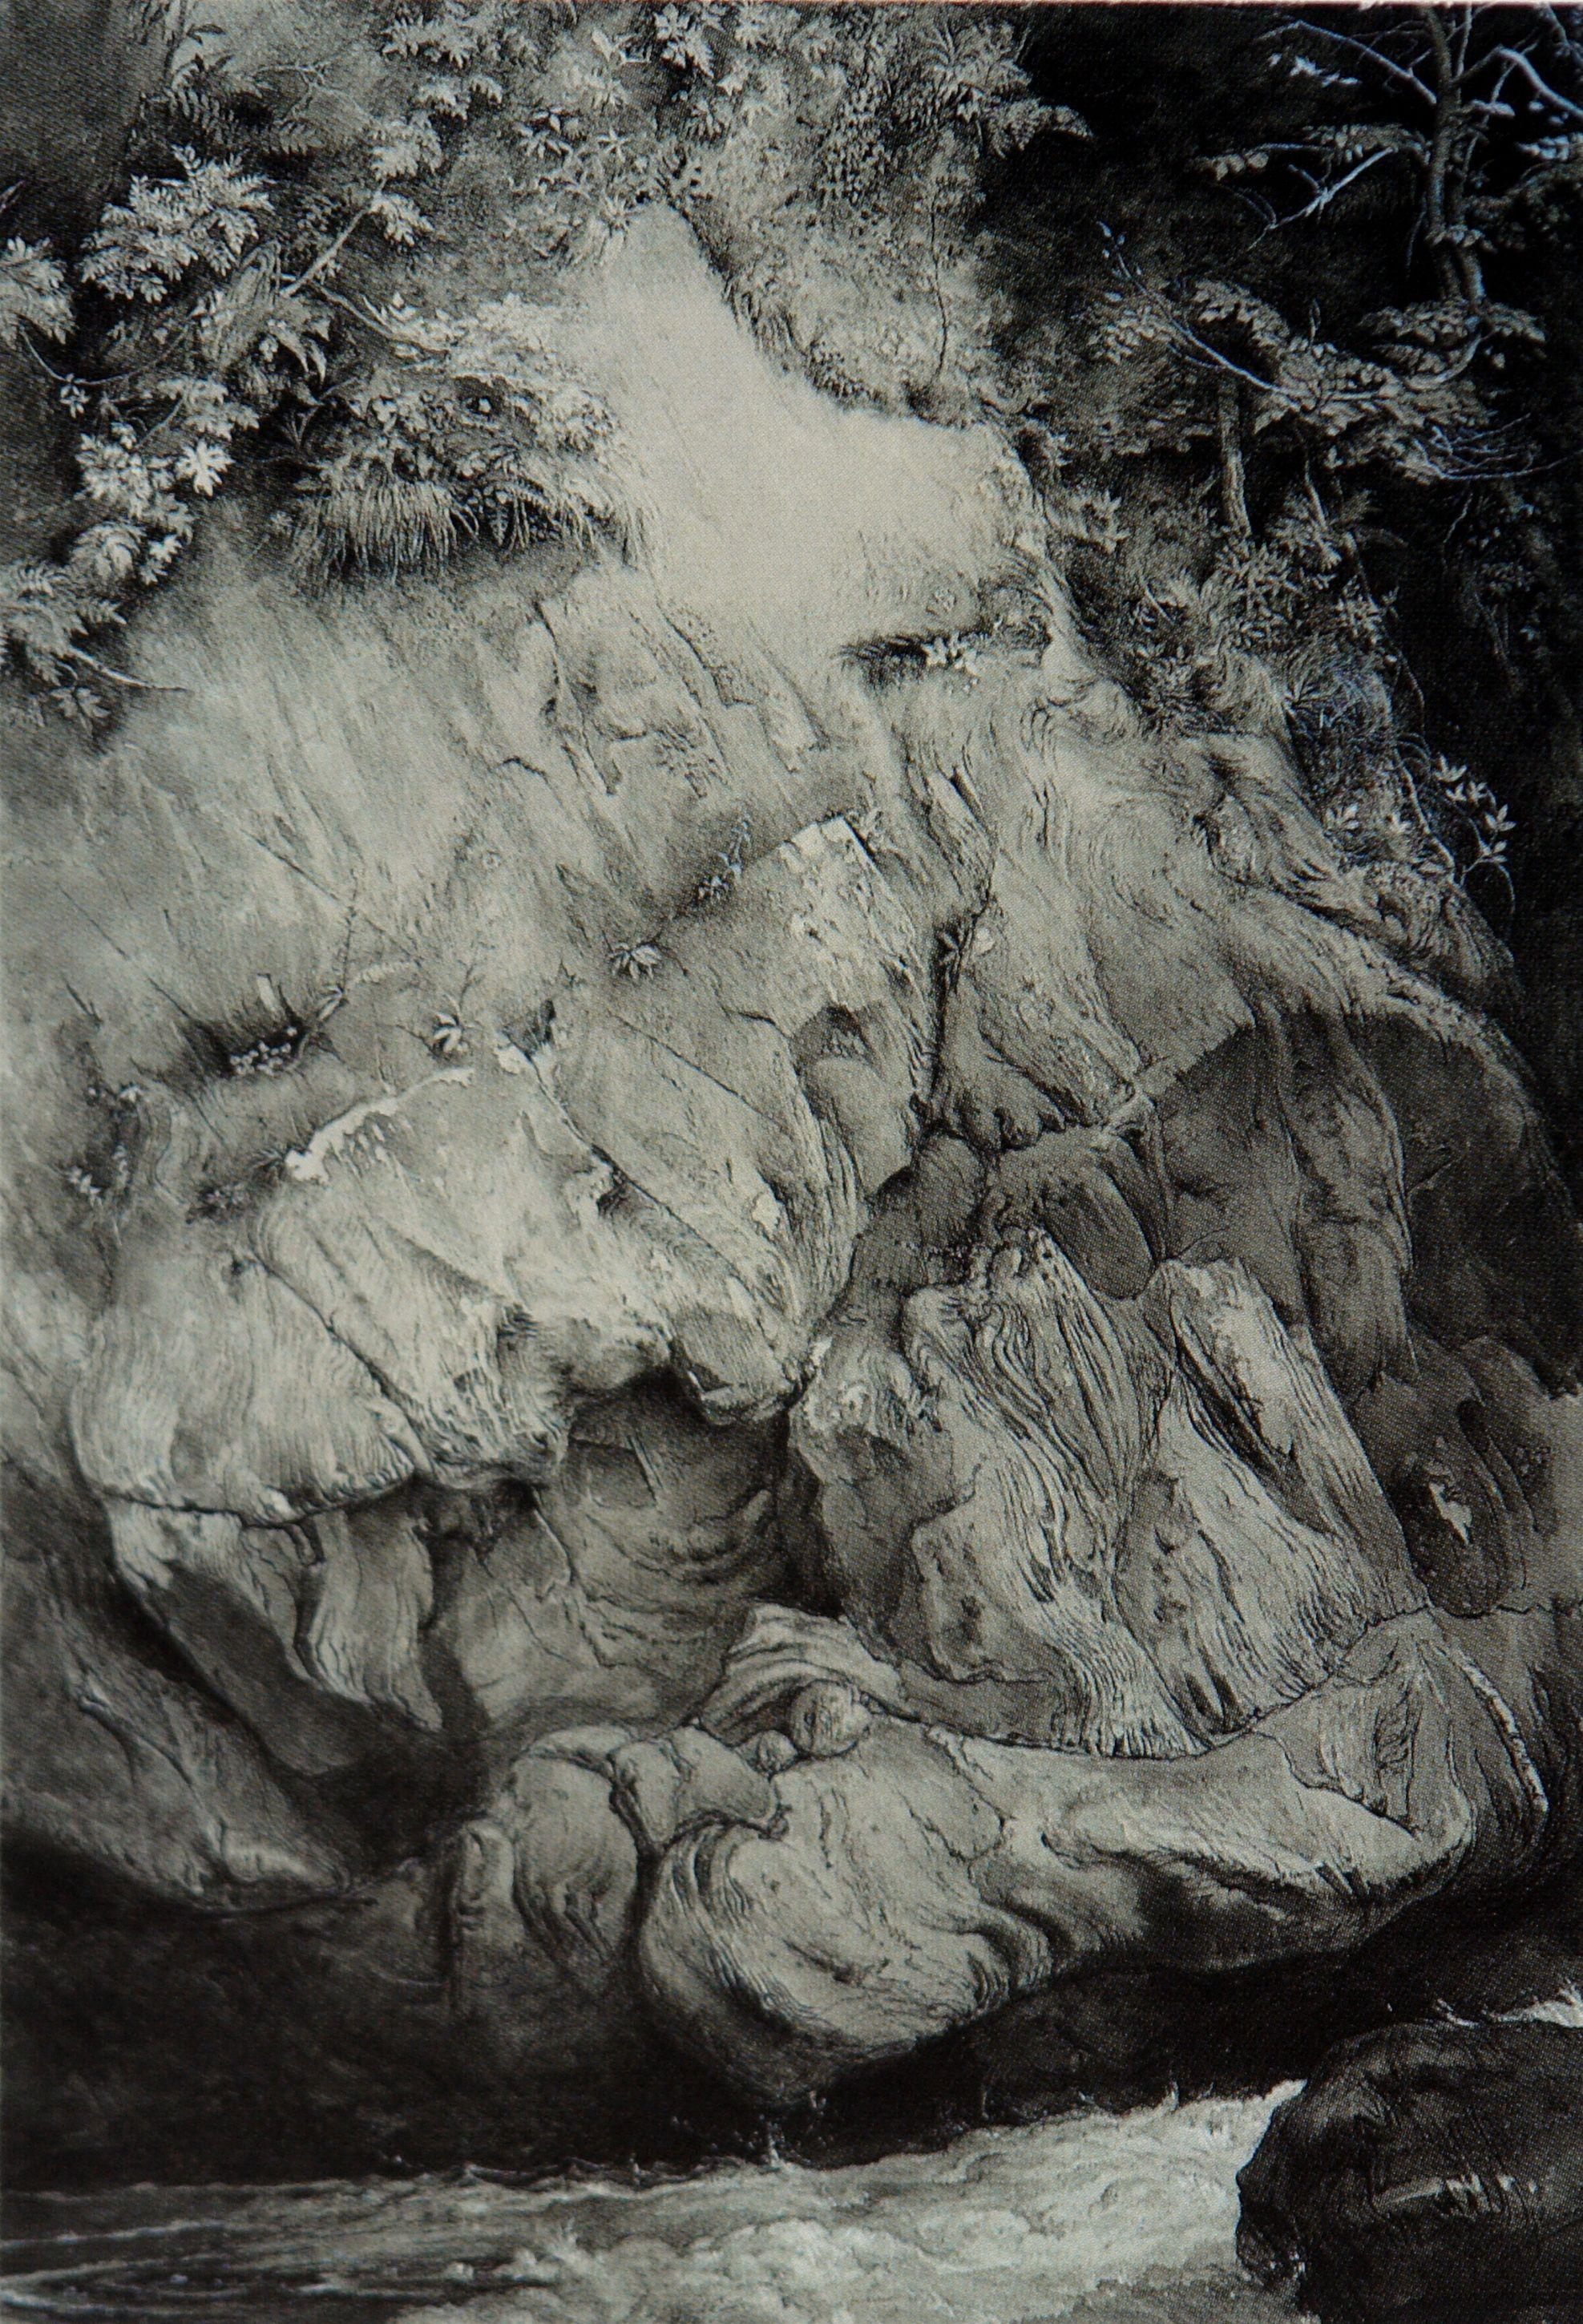 John Ruskin - study of gneiss rocks - 1853